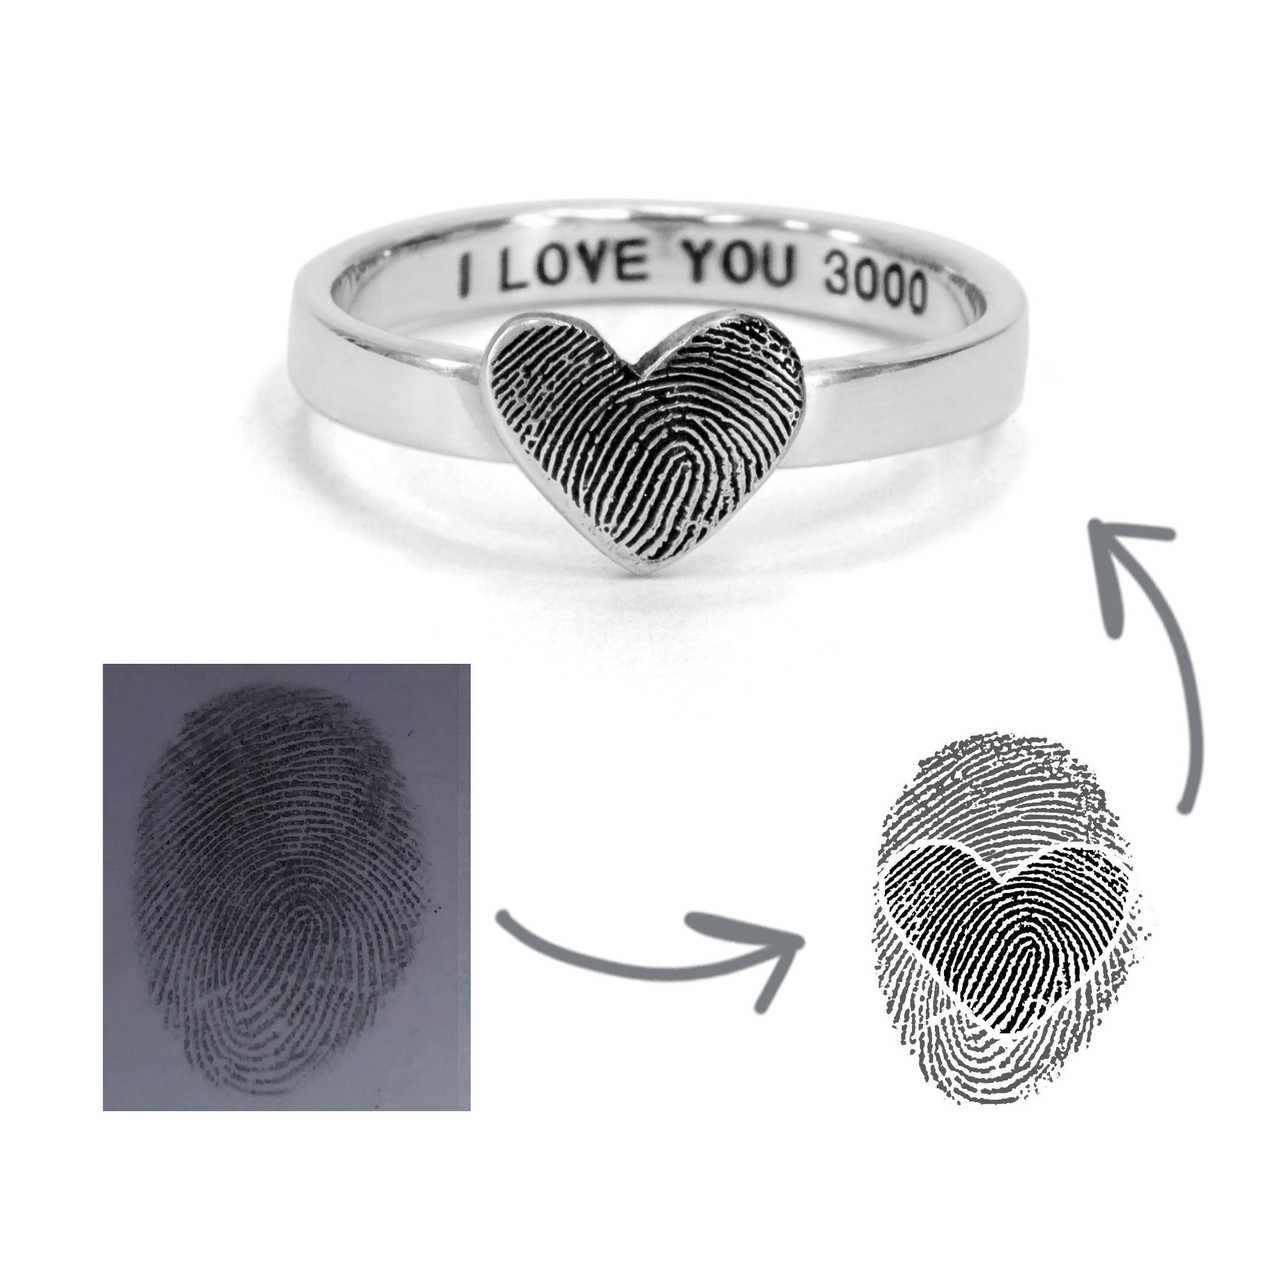 How we put your fingerprint onto a sterling silver fingerprint ring